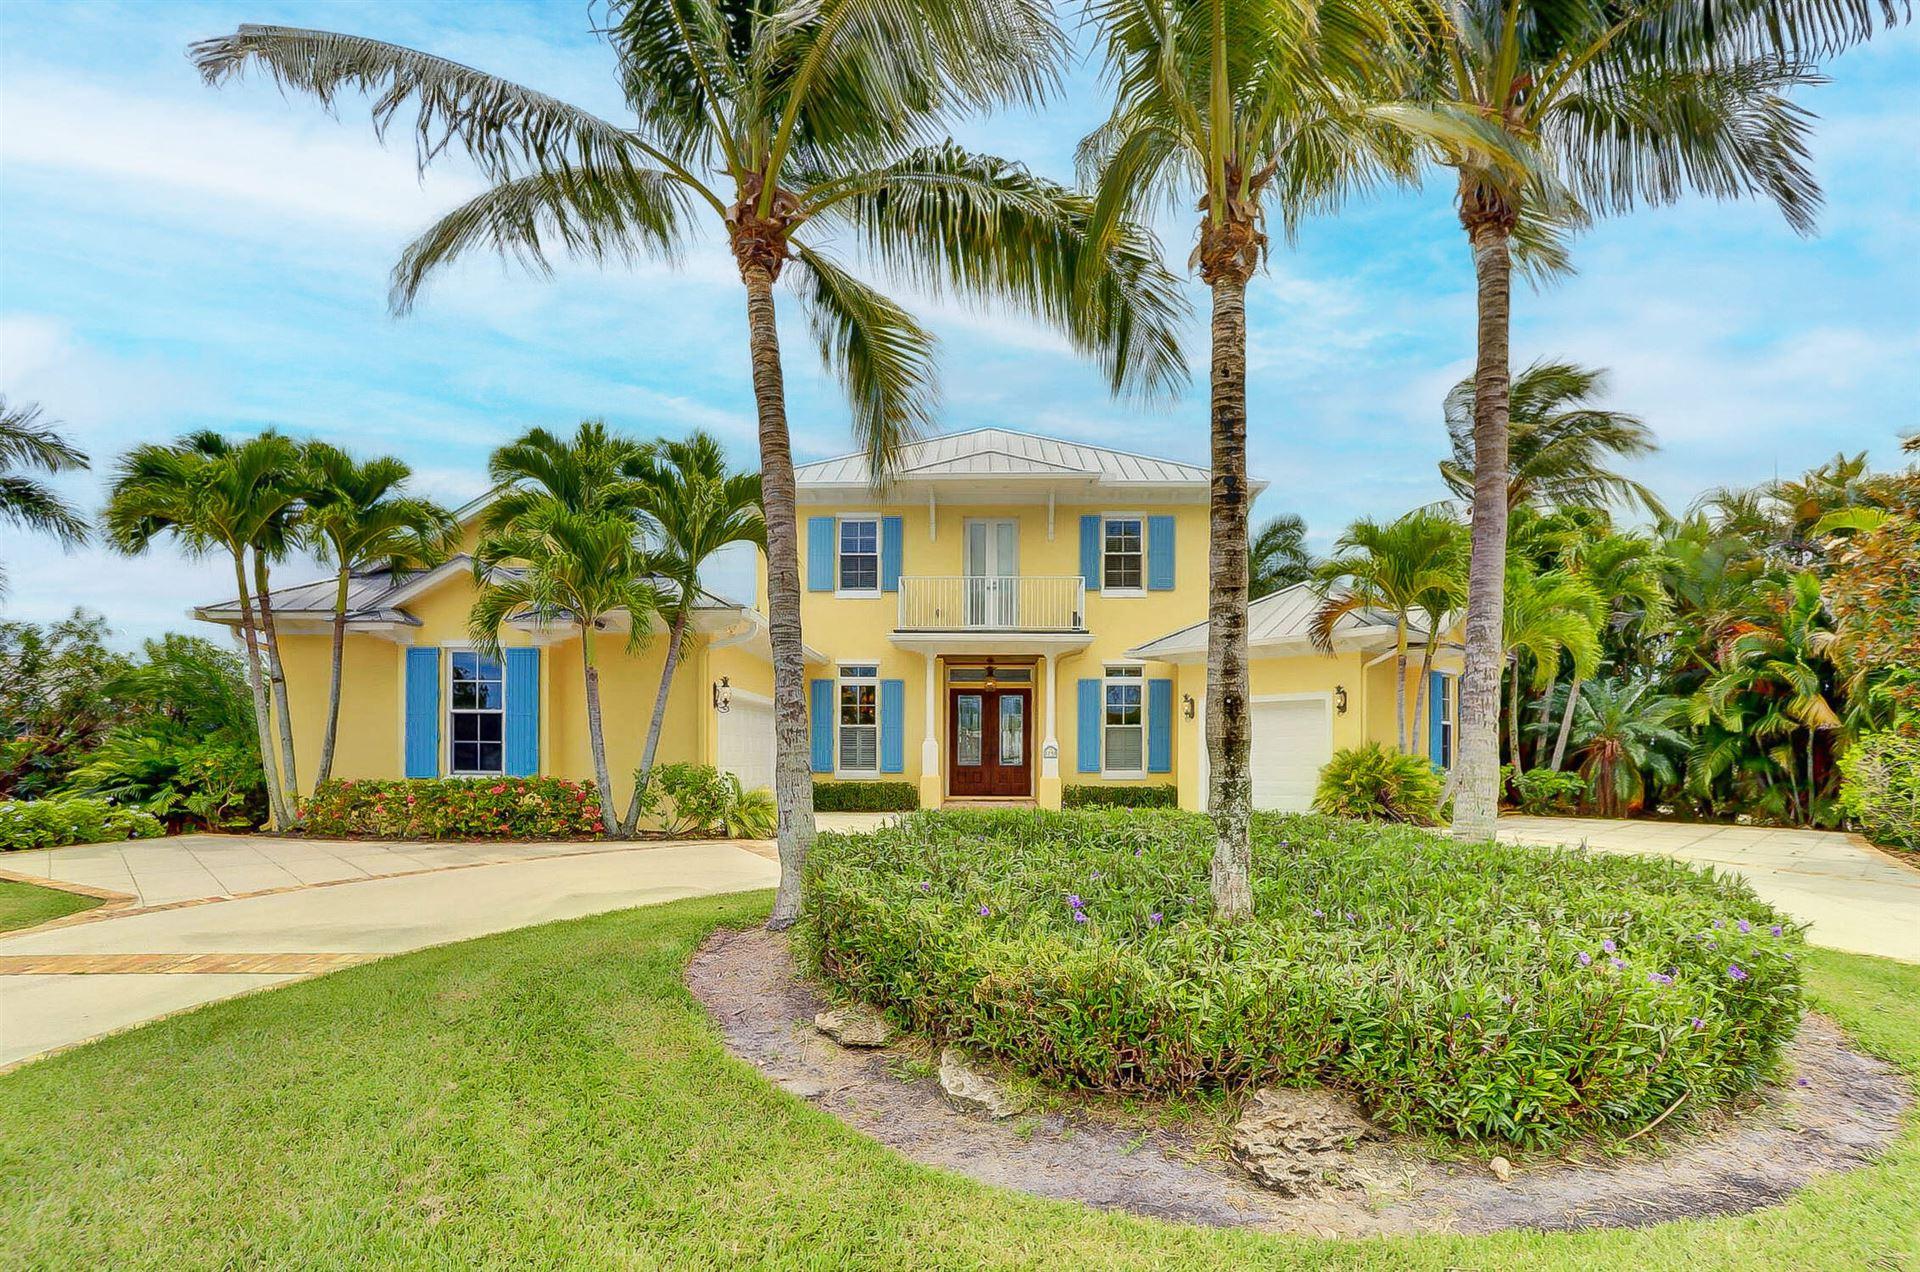 Photo of 15 Dolphin Drive, Vero Beach, FL 32960 (MLS # RX-10731237)